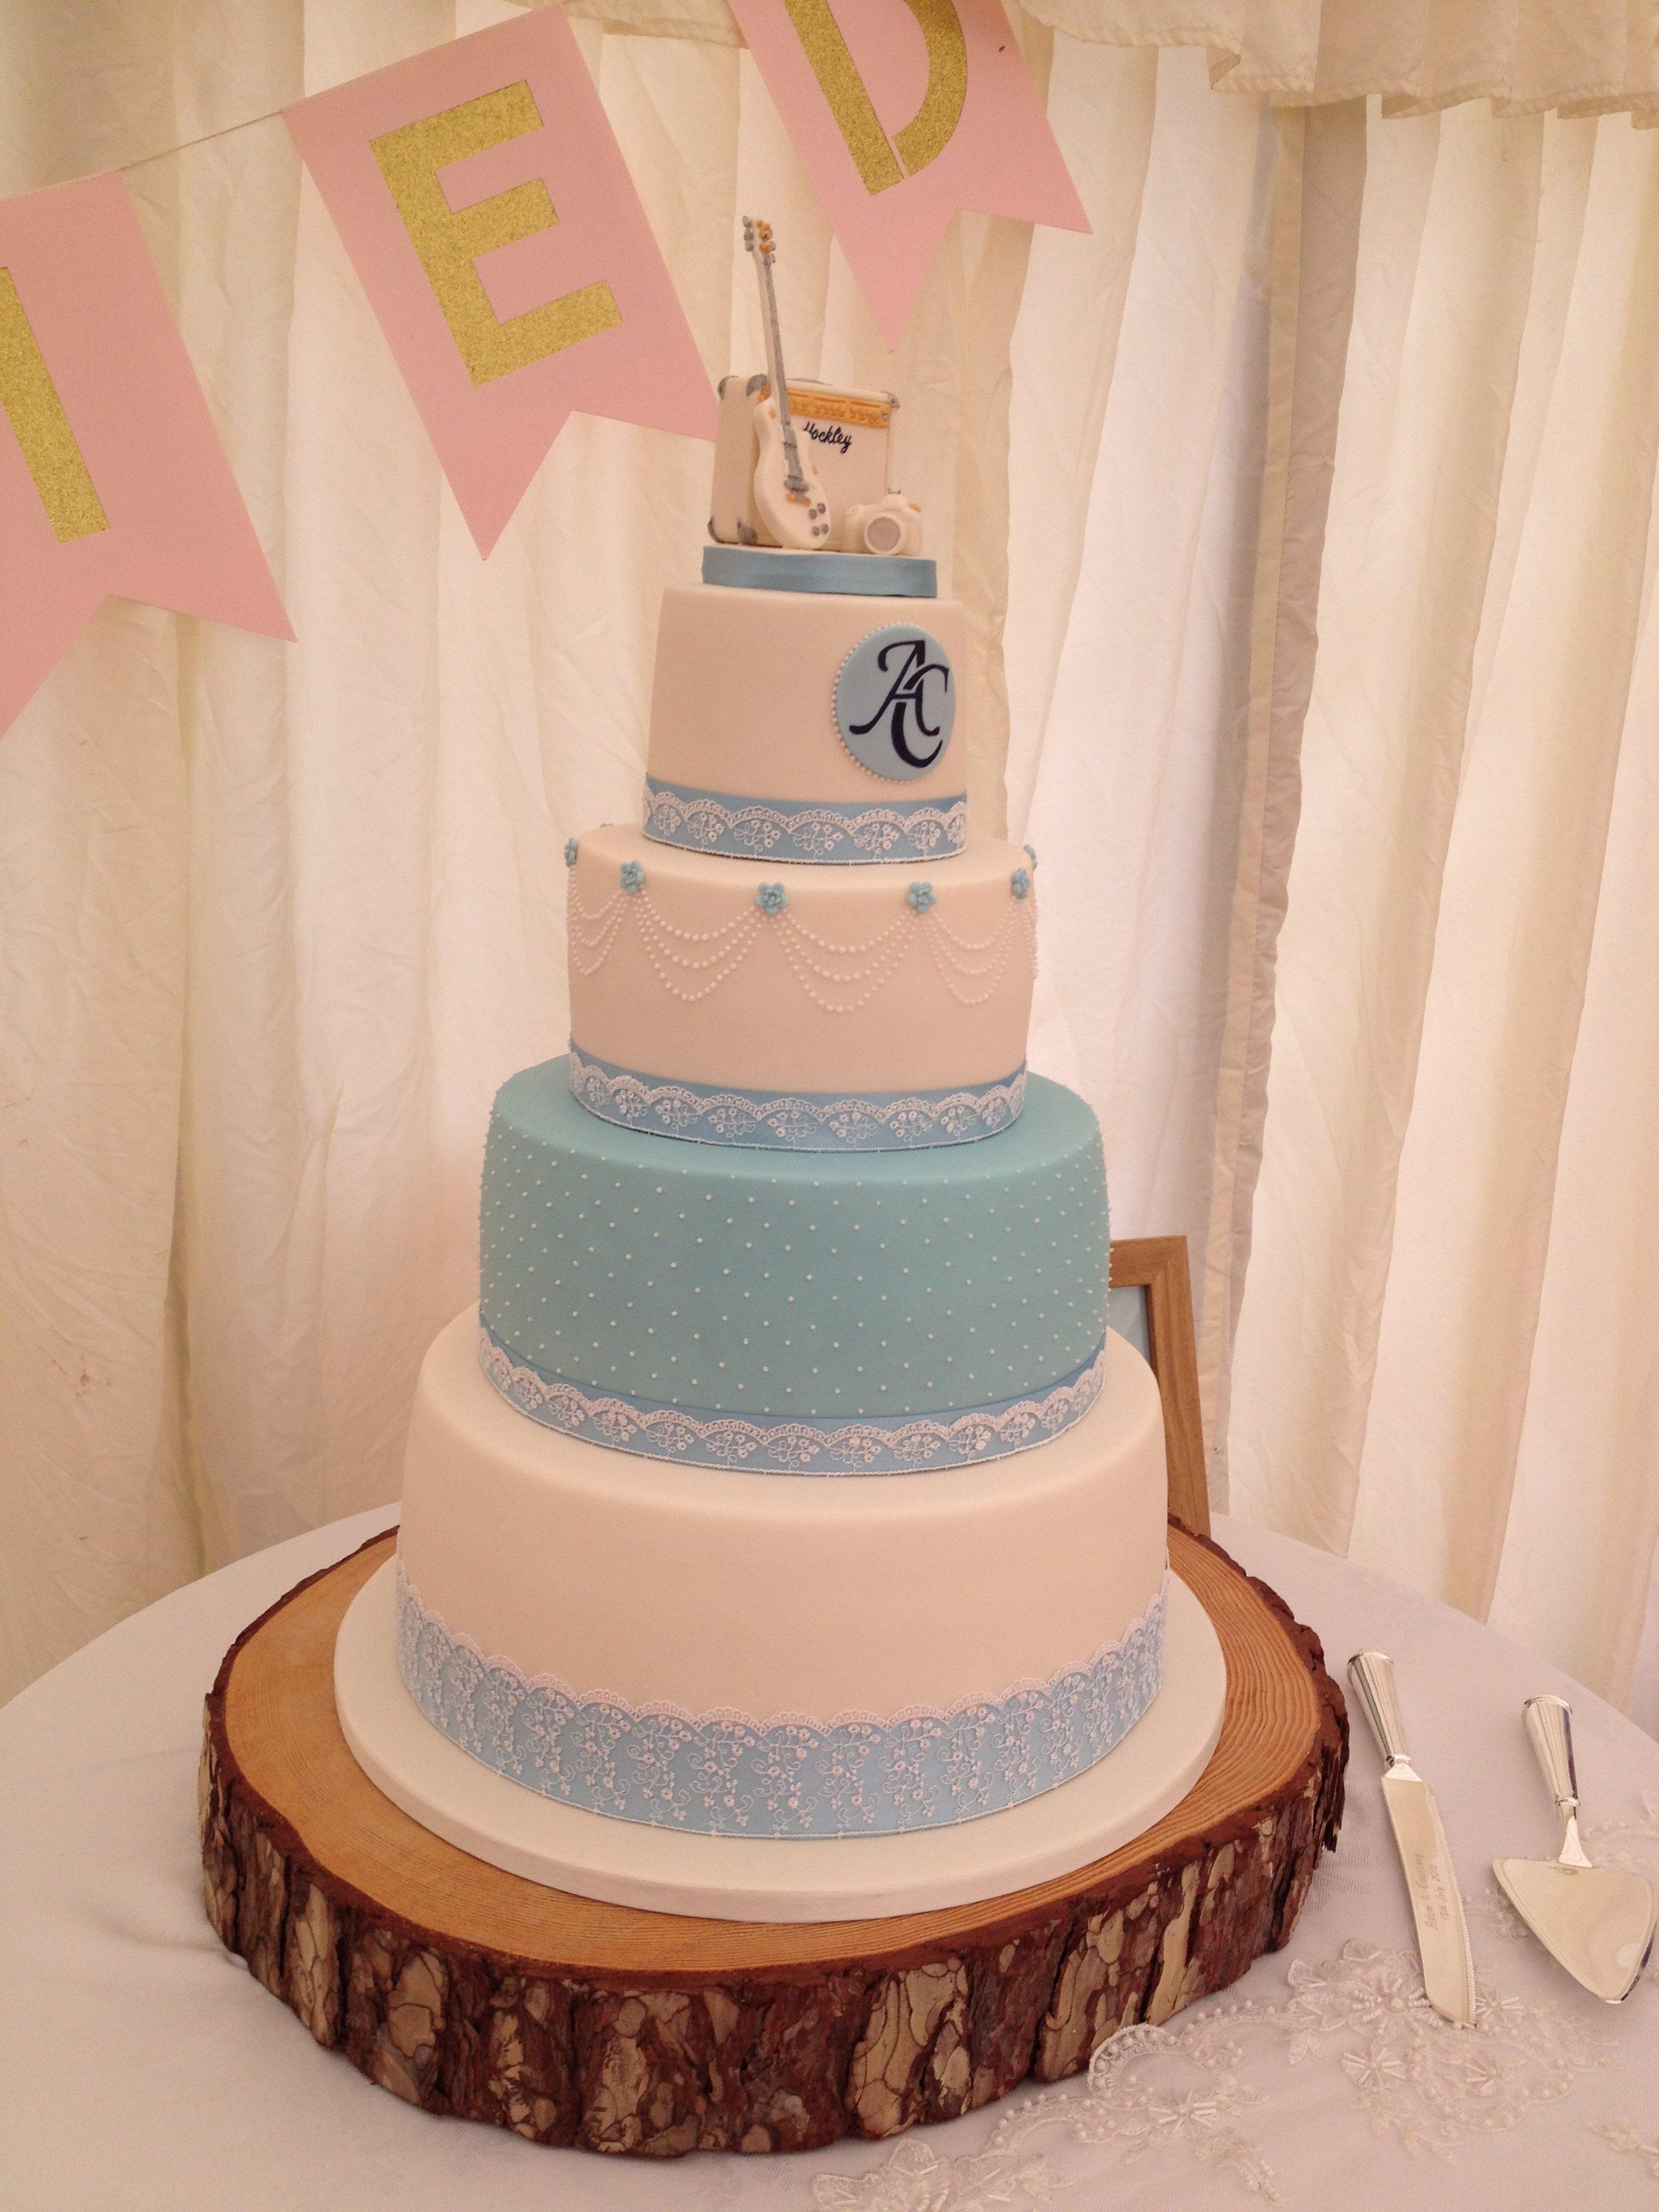 Camera and Amp Wedding Cake 1